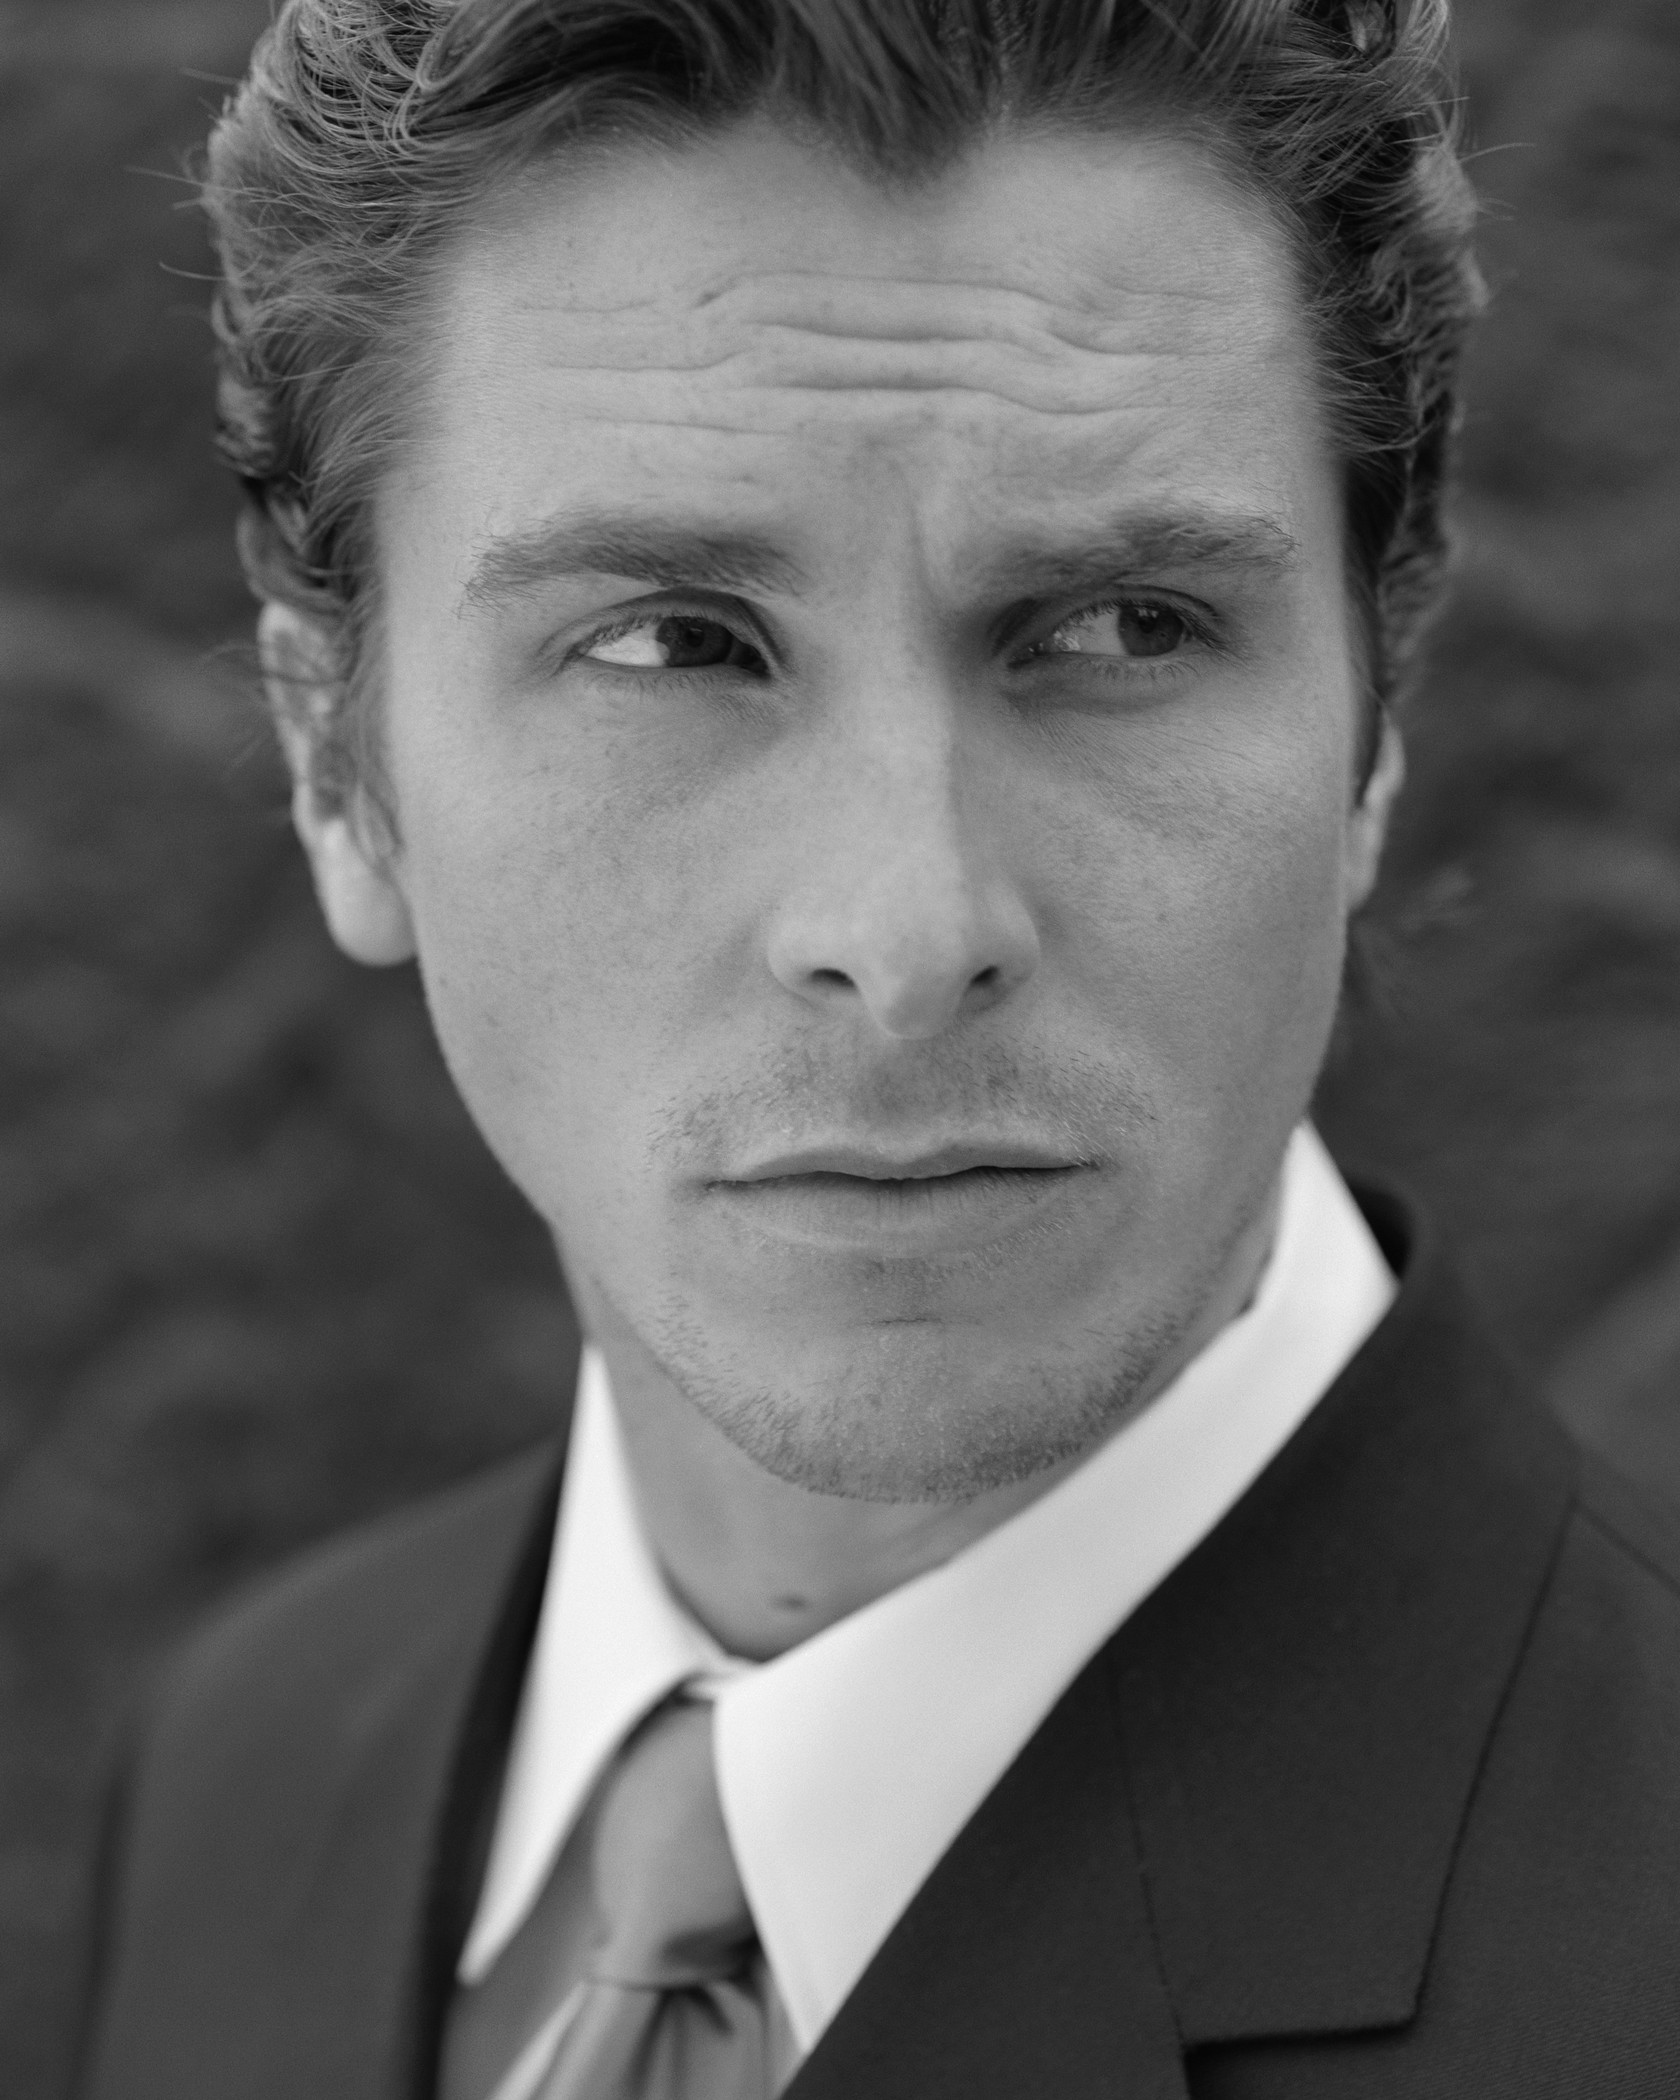 Christian Bale - Images Actress